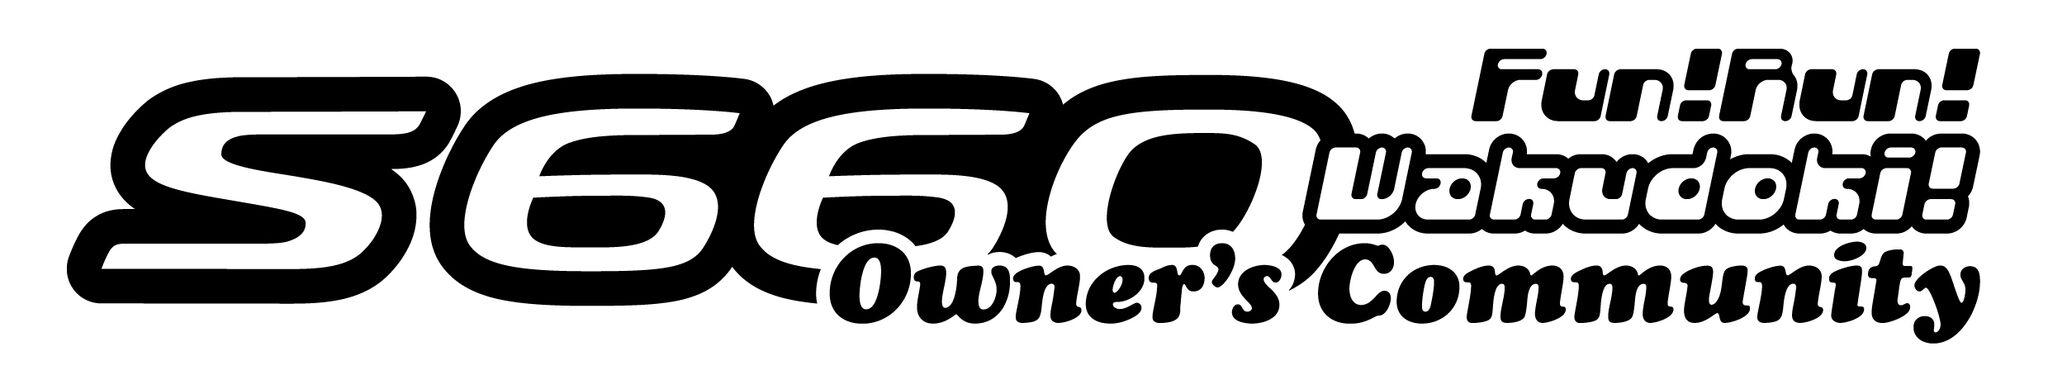 S660 Community